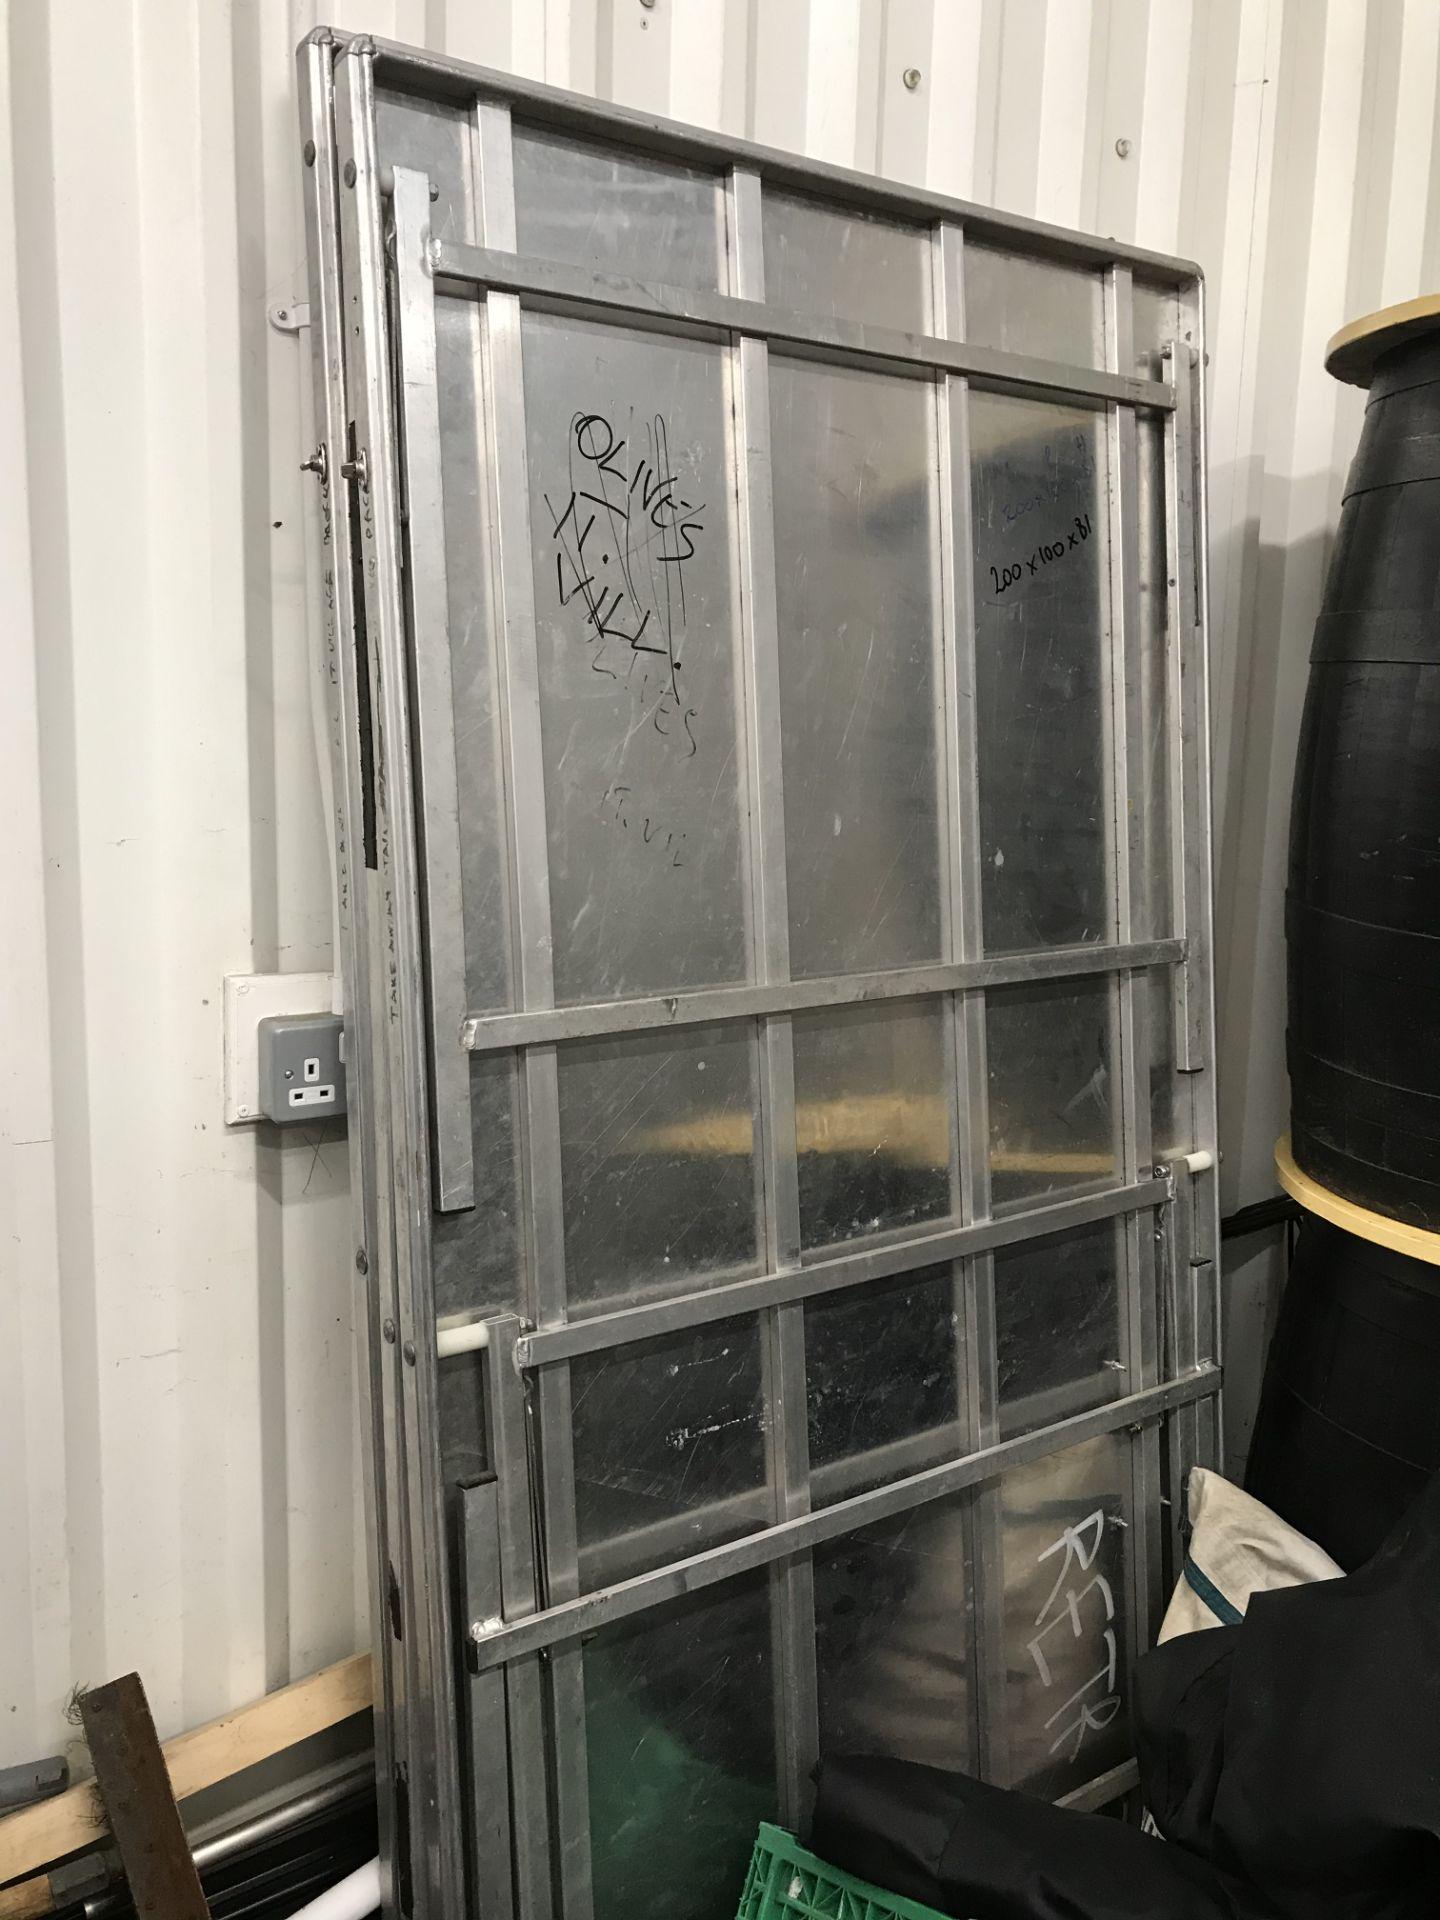 Lot 58 - 3 x Aluminium Collapsible Tables | 200cm x 100cm x 81cm